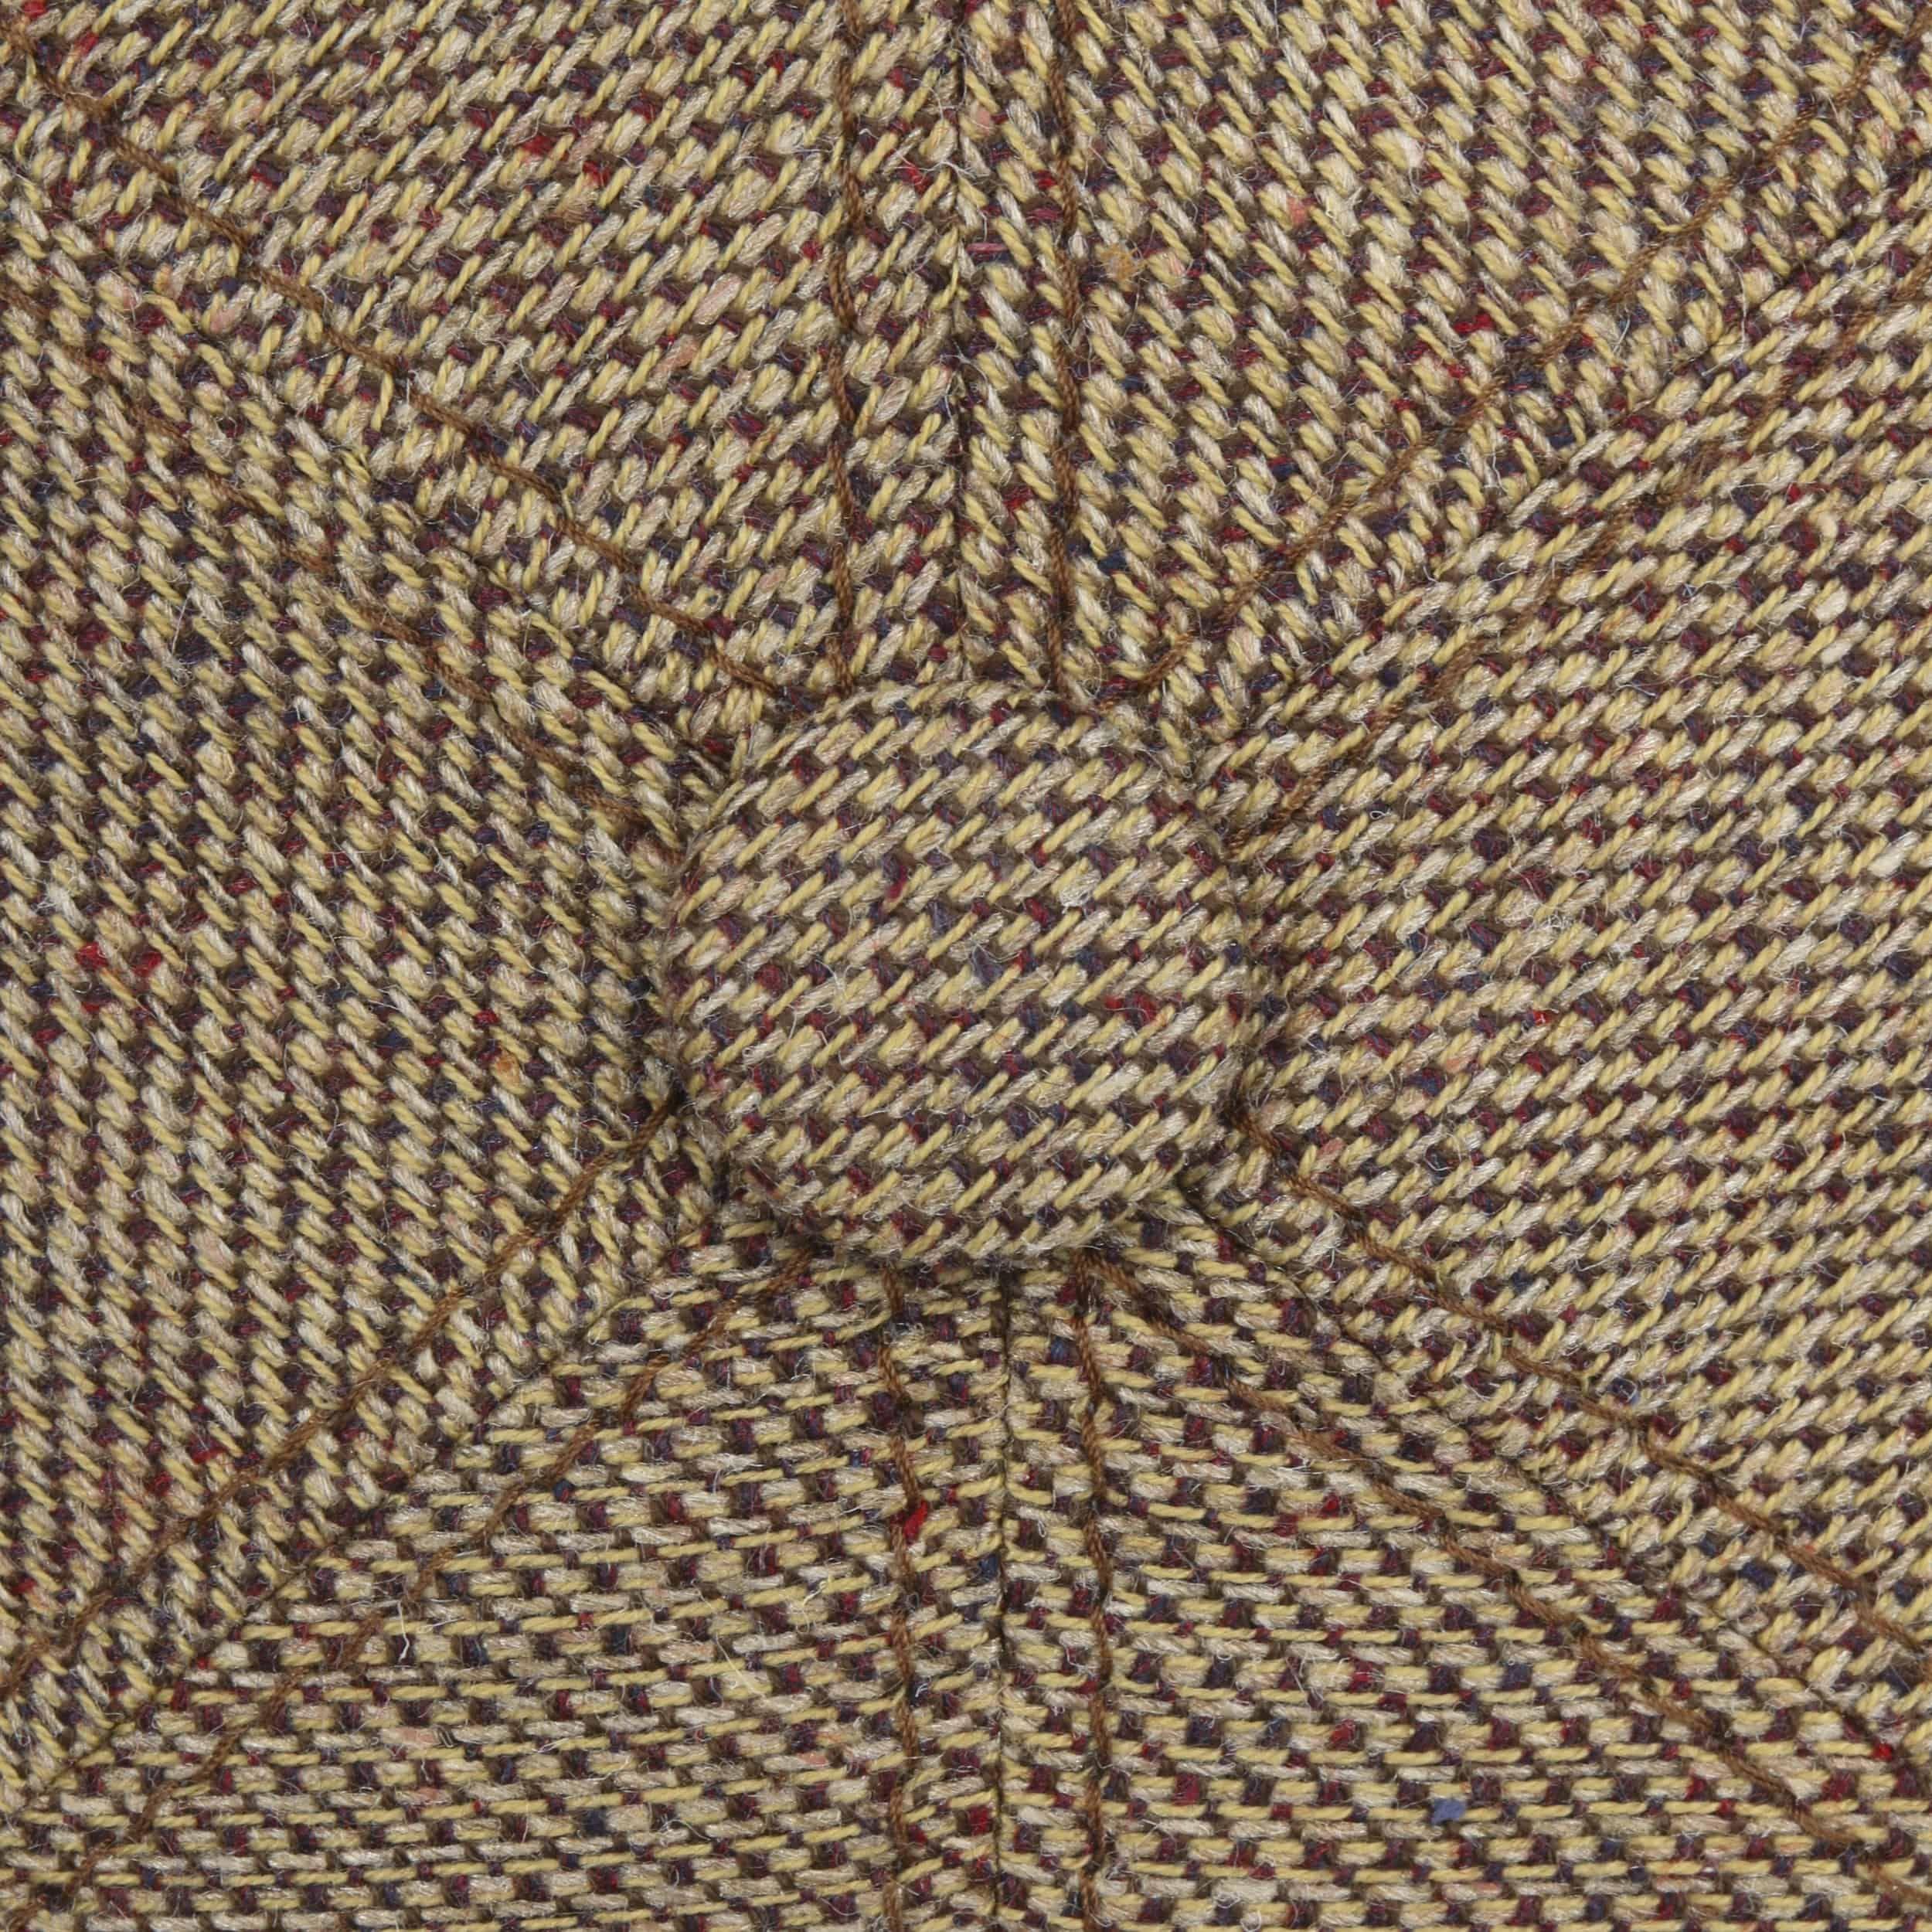 Carnsville 6 Panel Flat Cap brown-mottled